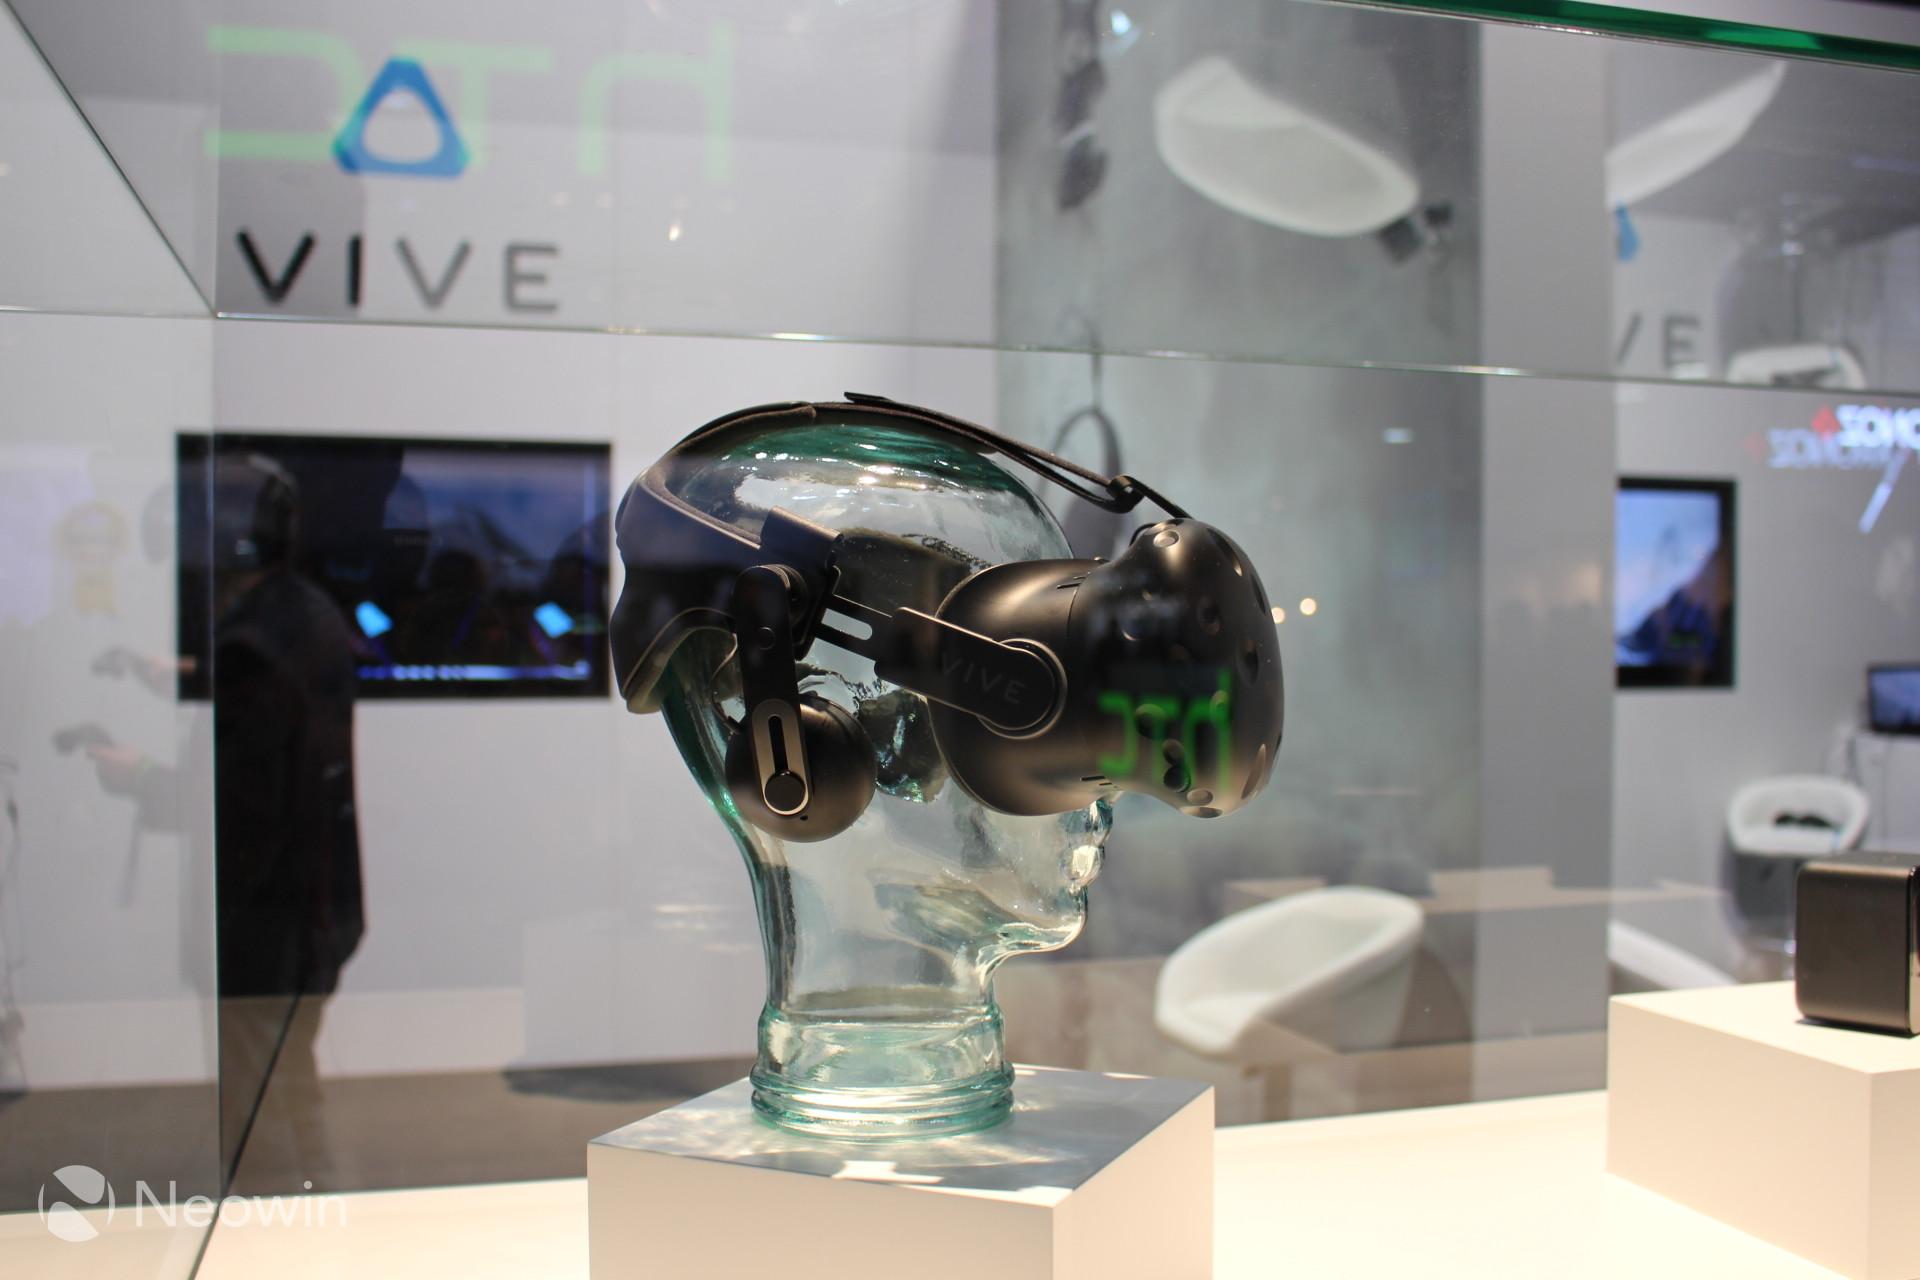 SteamVR Tracking 2 0 improves base stations